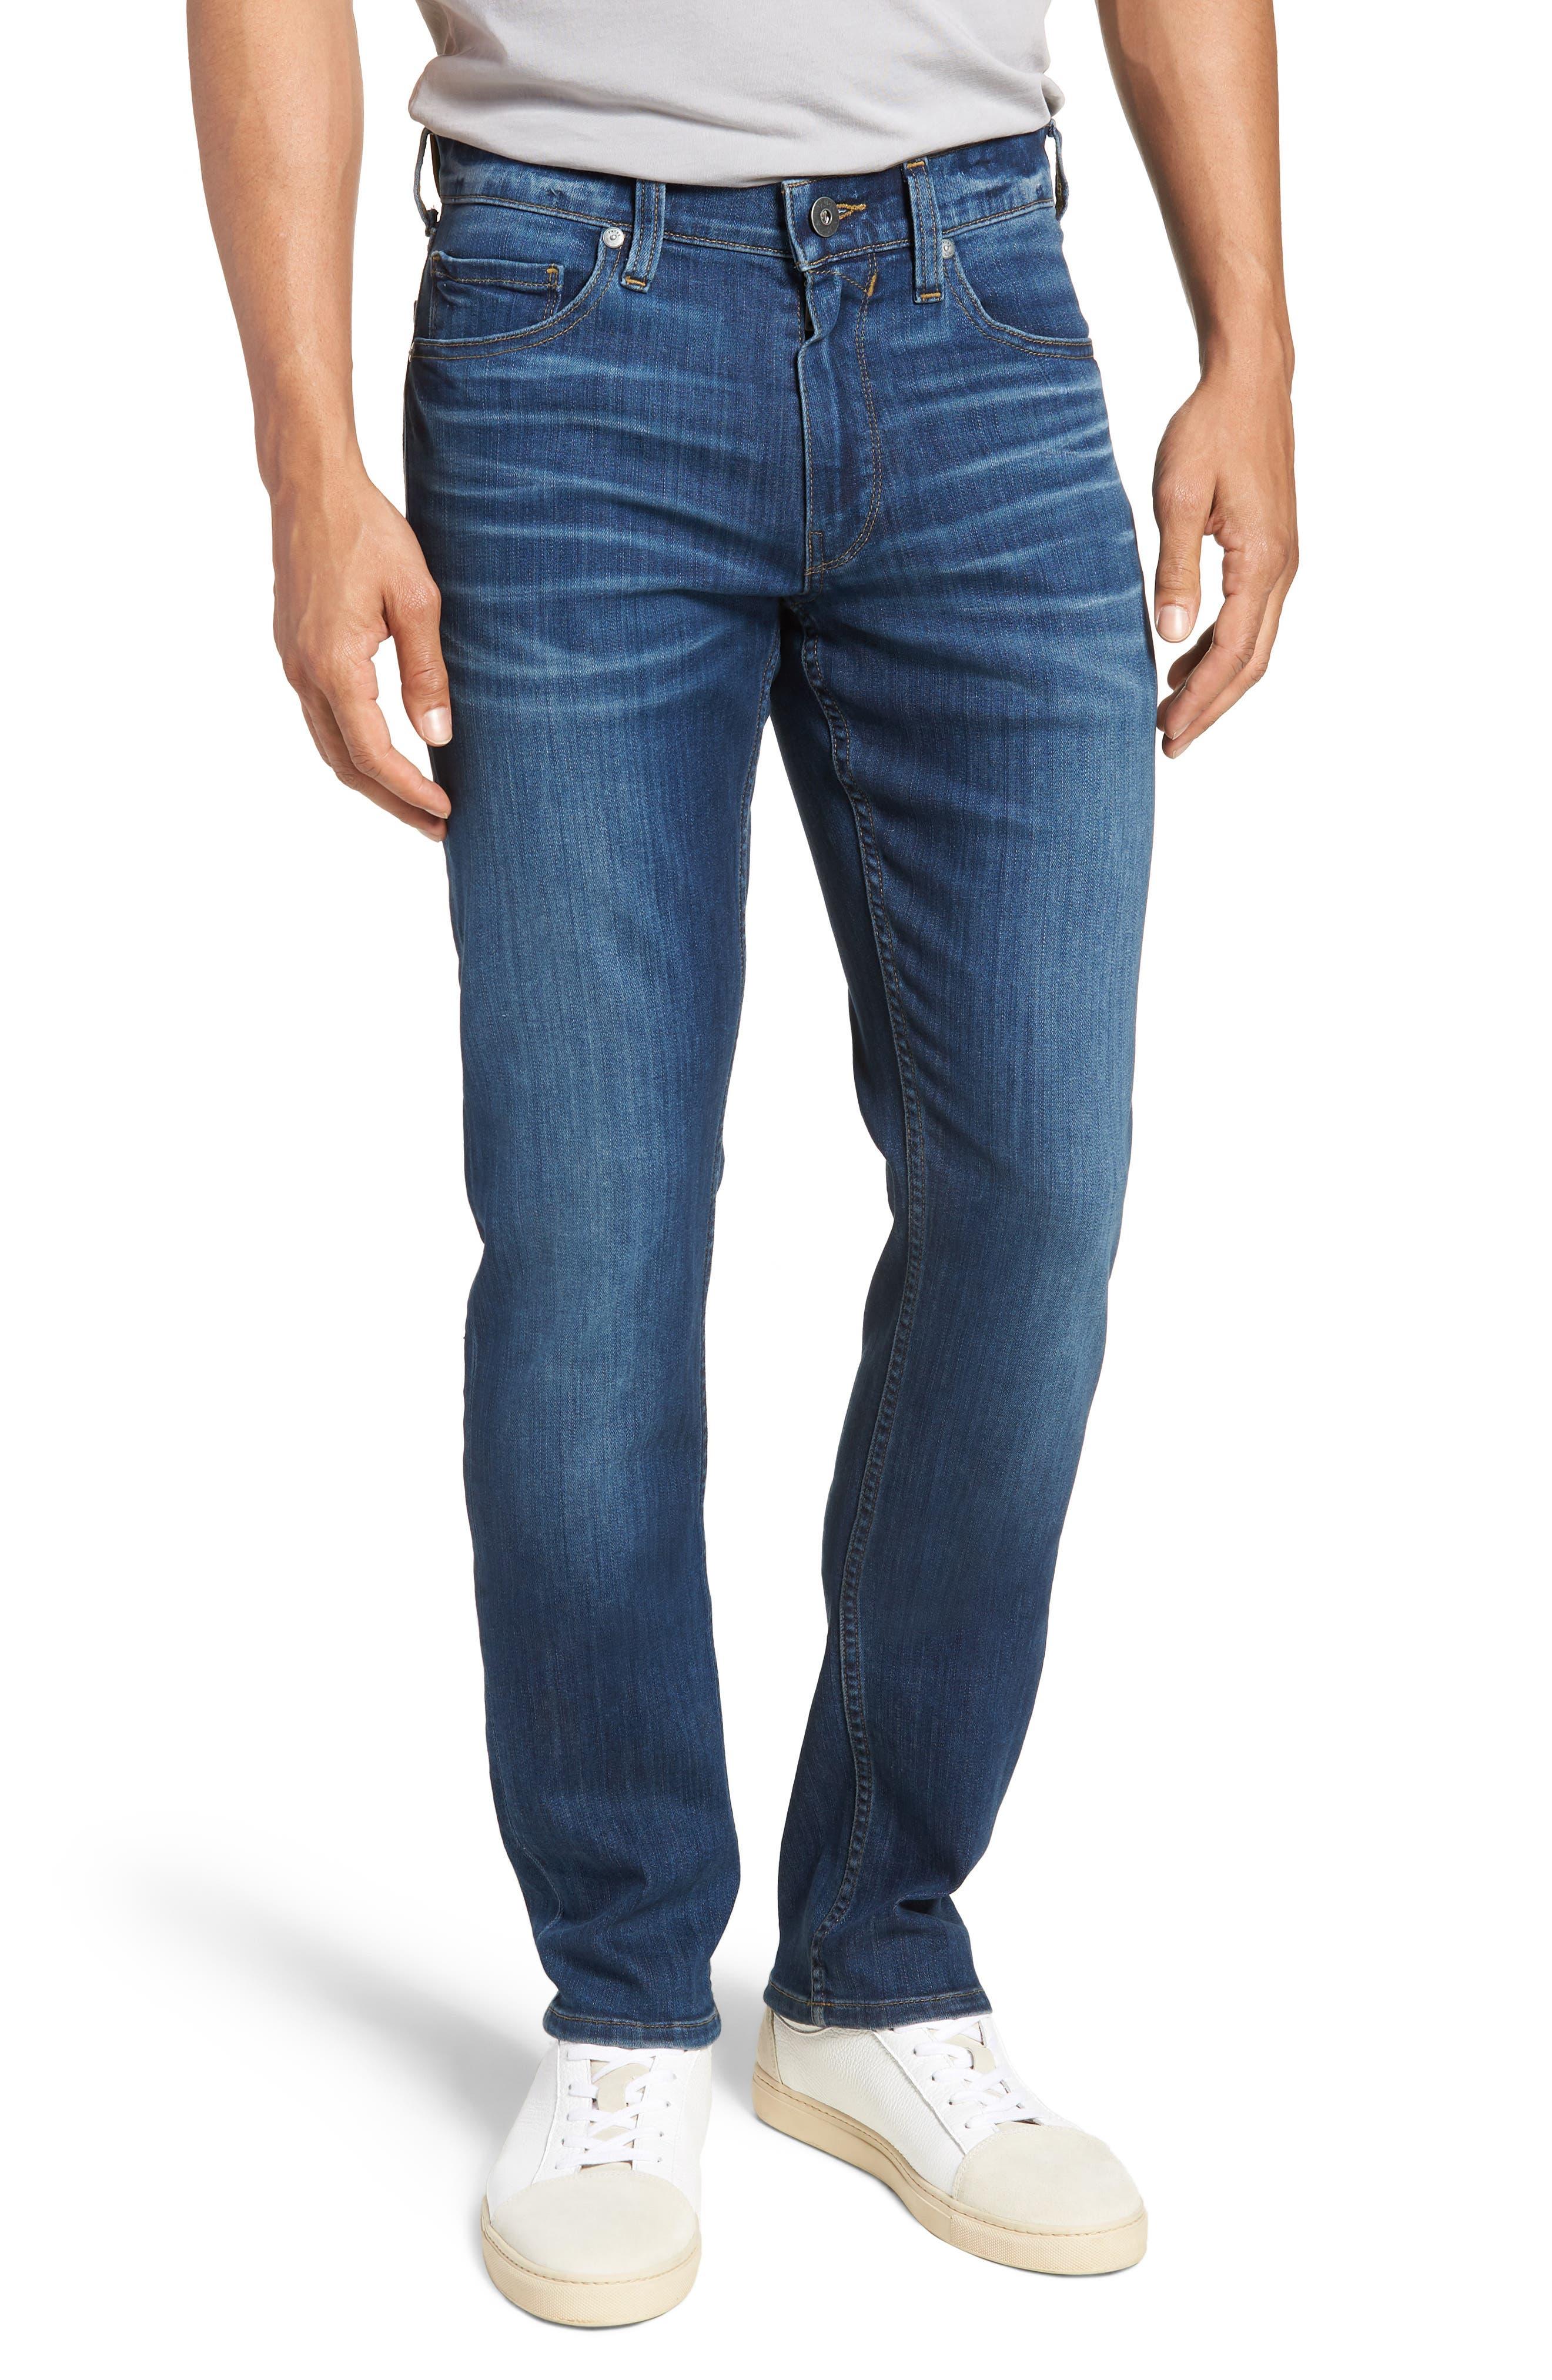 Transcend - Lennox Slim Fit Jeans,                         Main,                         color, Ashbrook